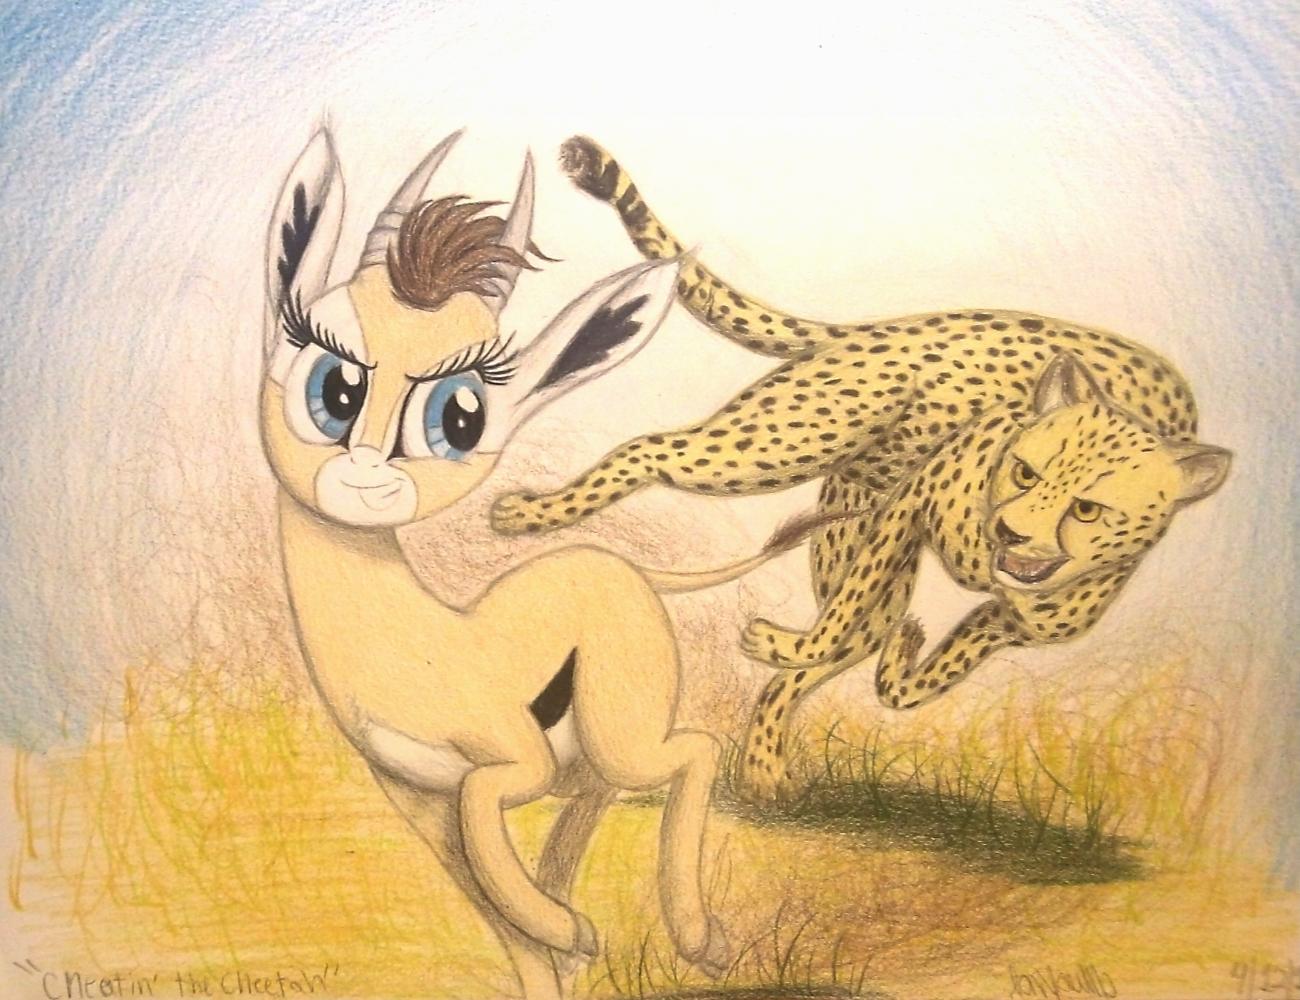 Drawn hunting cheetah The Cheetah Cheatin' Cheatin' by